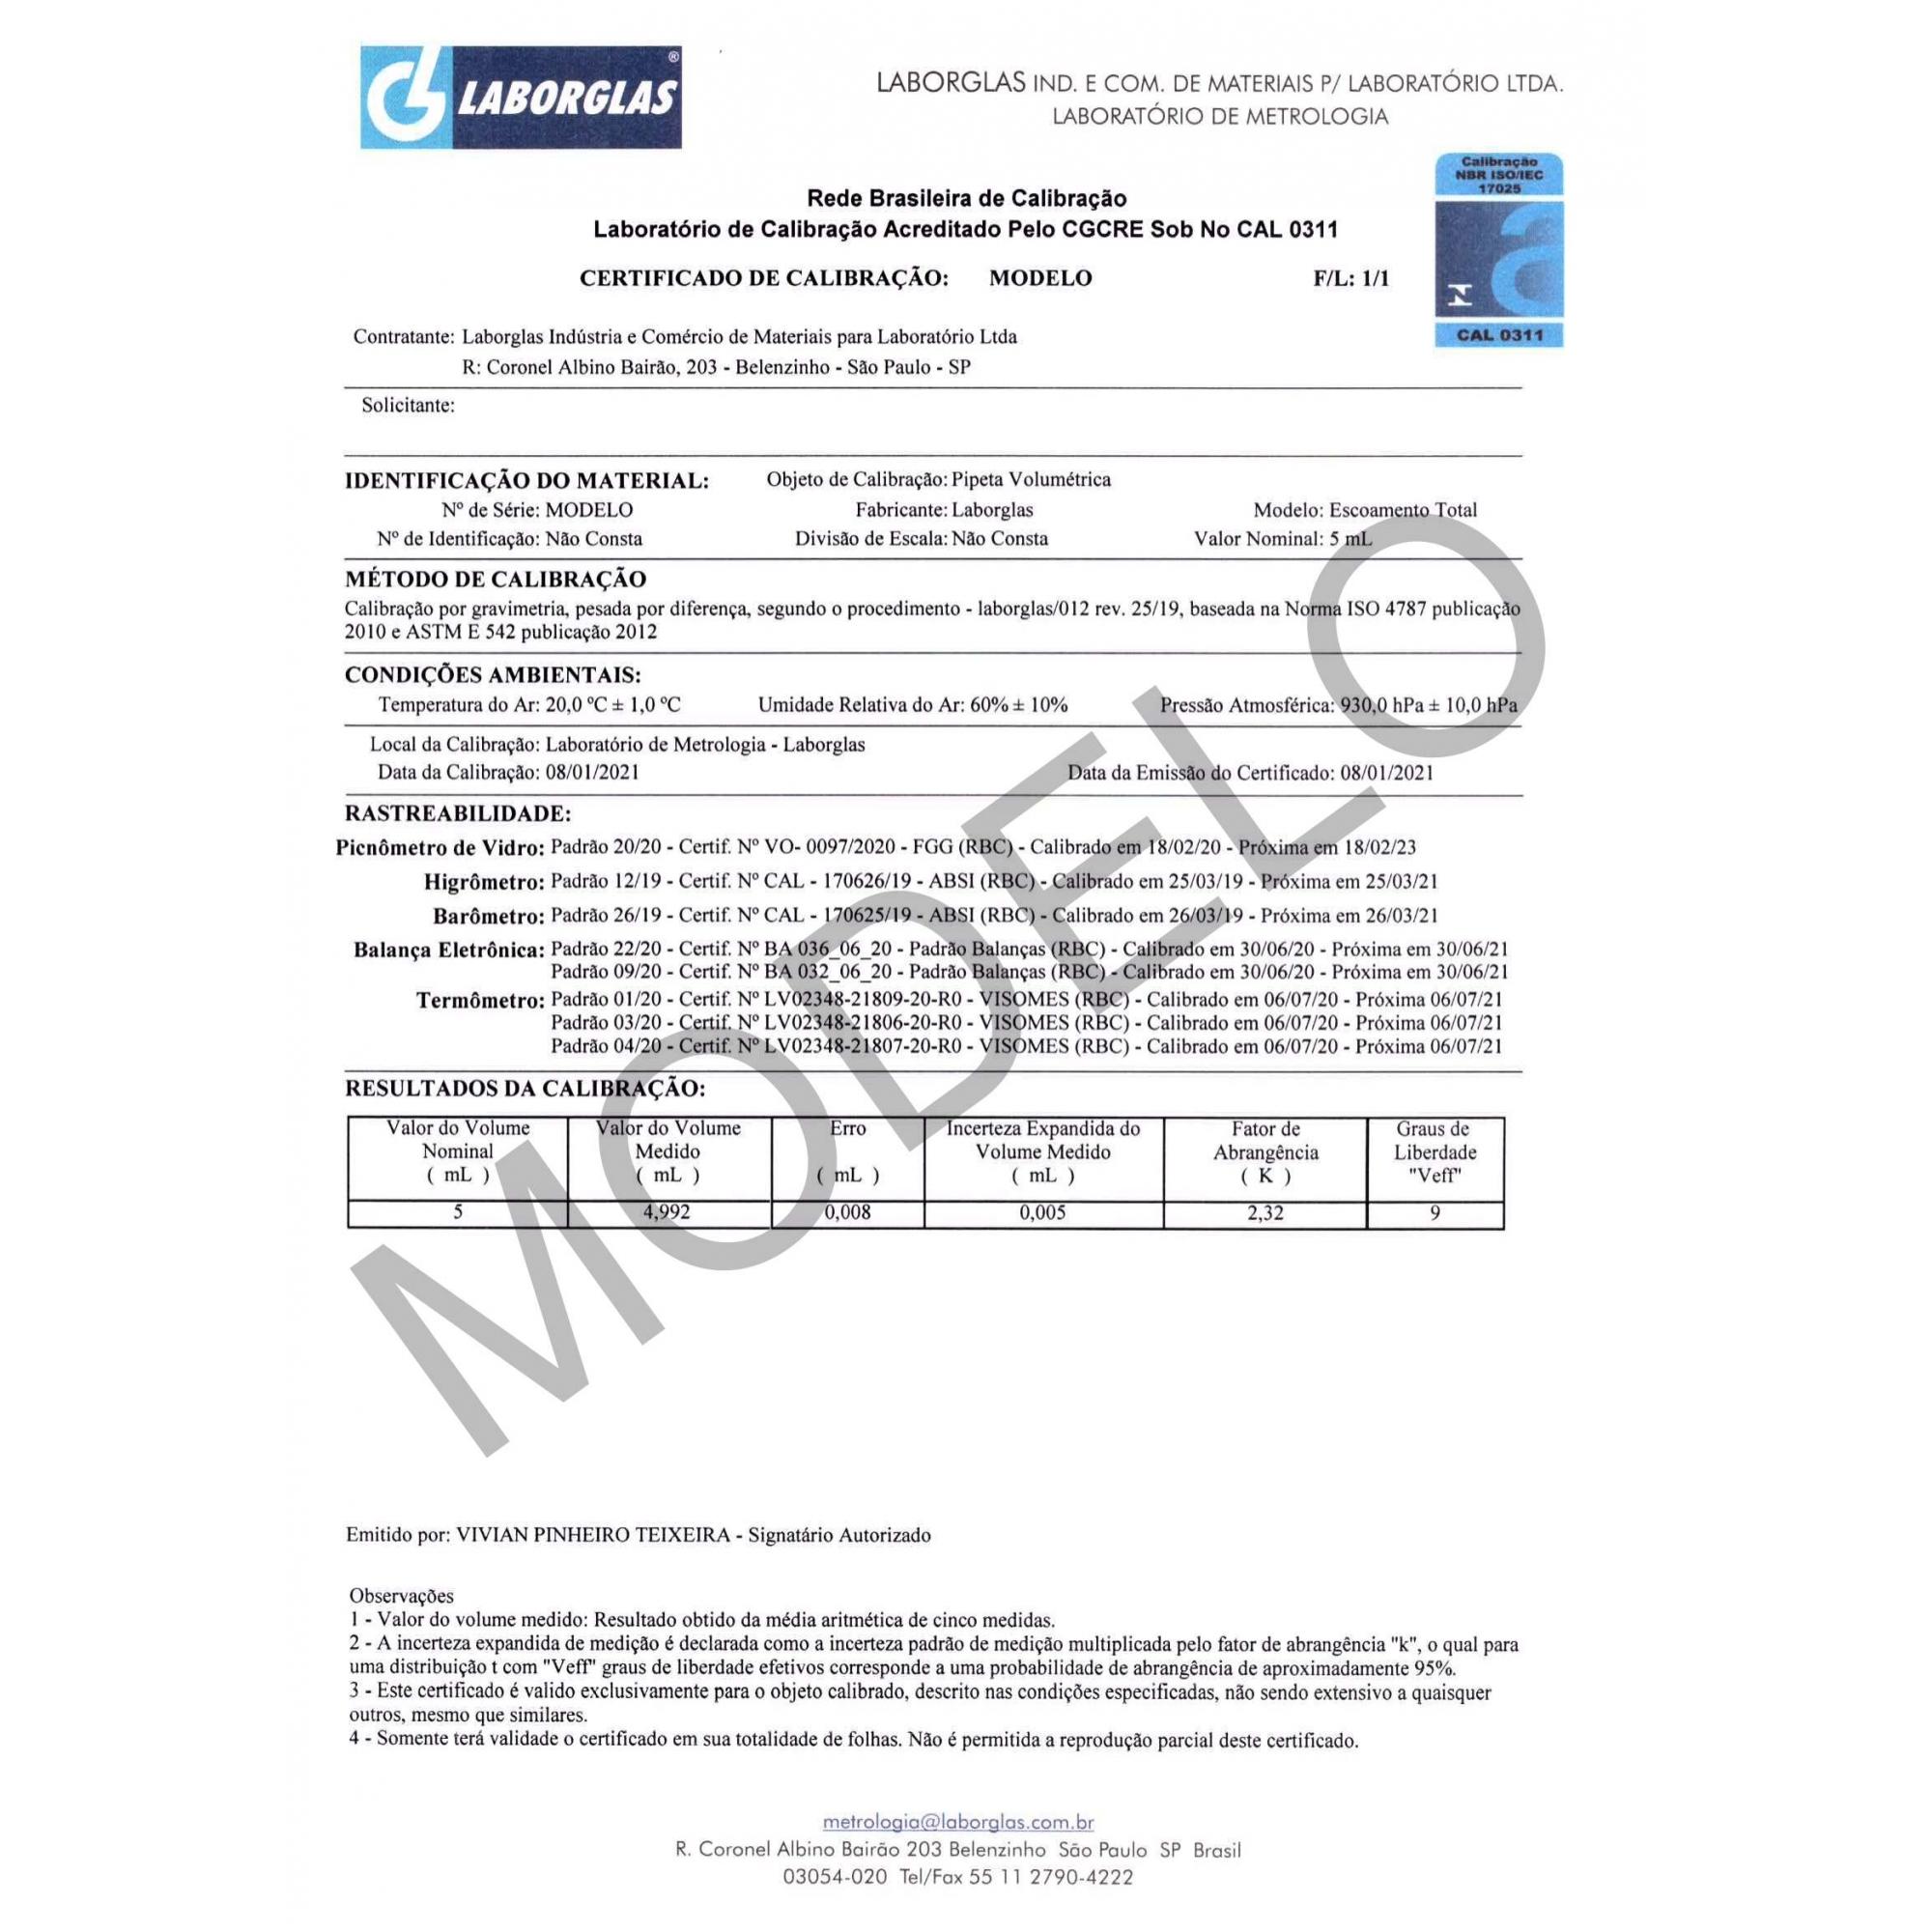 PIPETA VOLUMÉTRICA ESGOTAMENTO TOTAL 20 ML CERTIFICADO RBC - Laborglas - Cód. 9433714-R